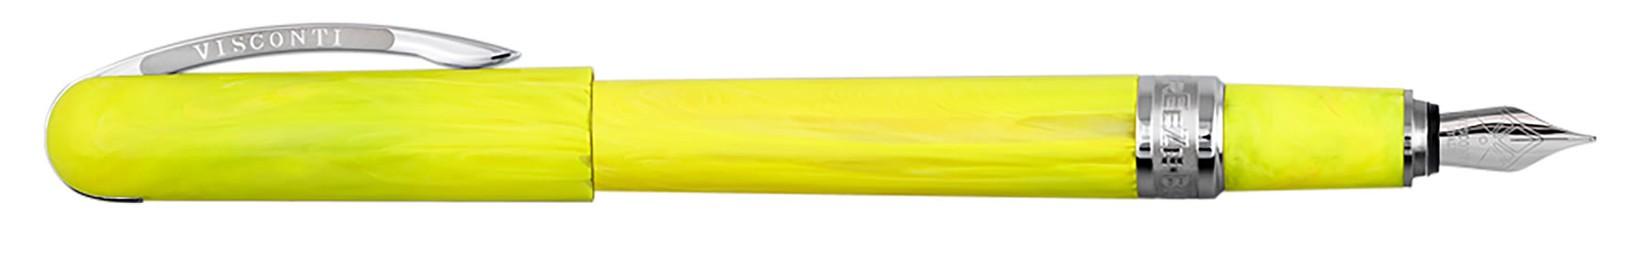 Visconti Breeze Lemon Fountain Pen